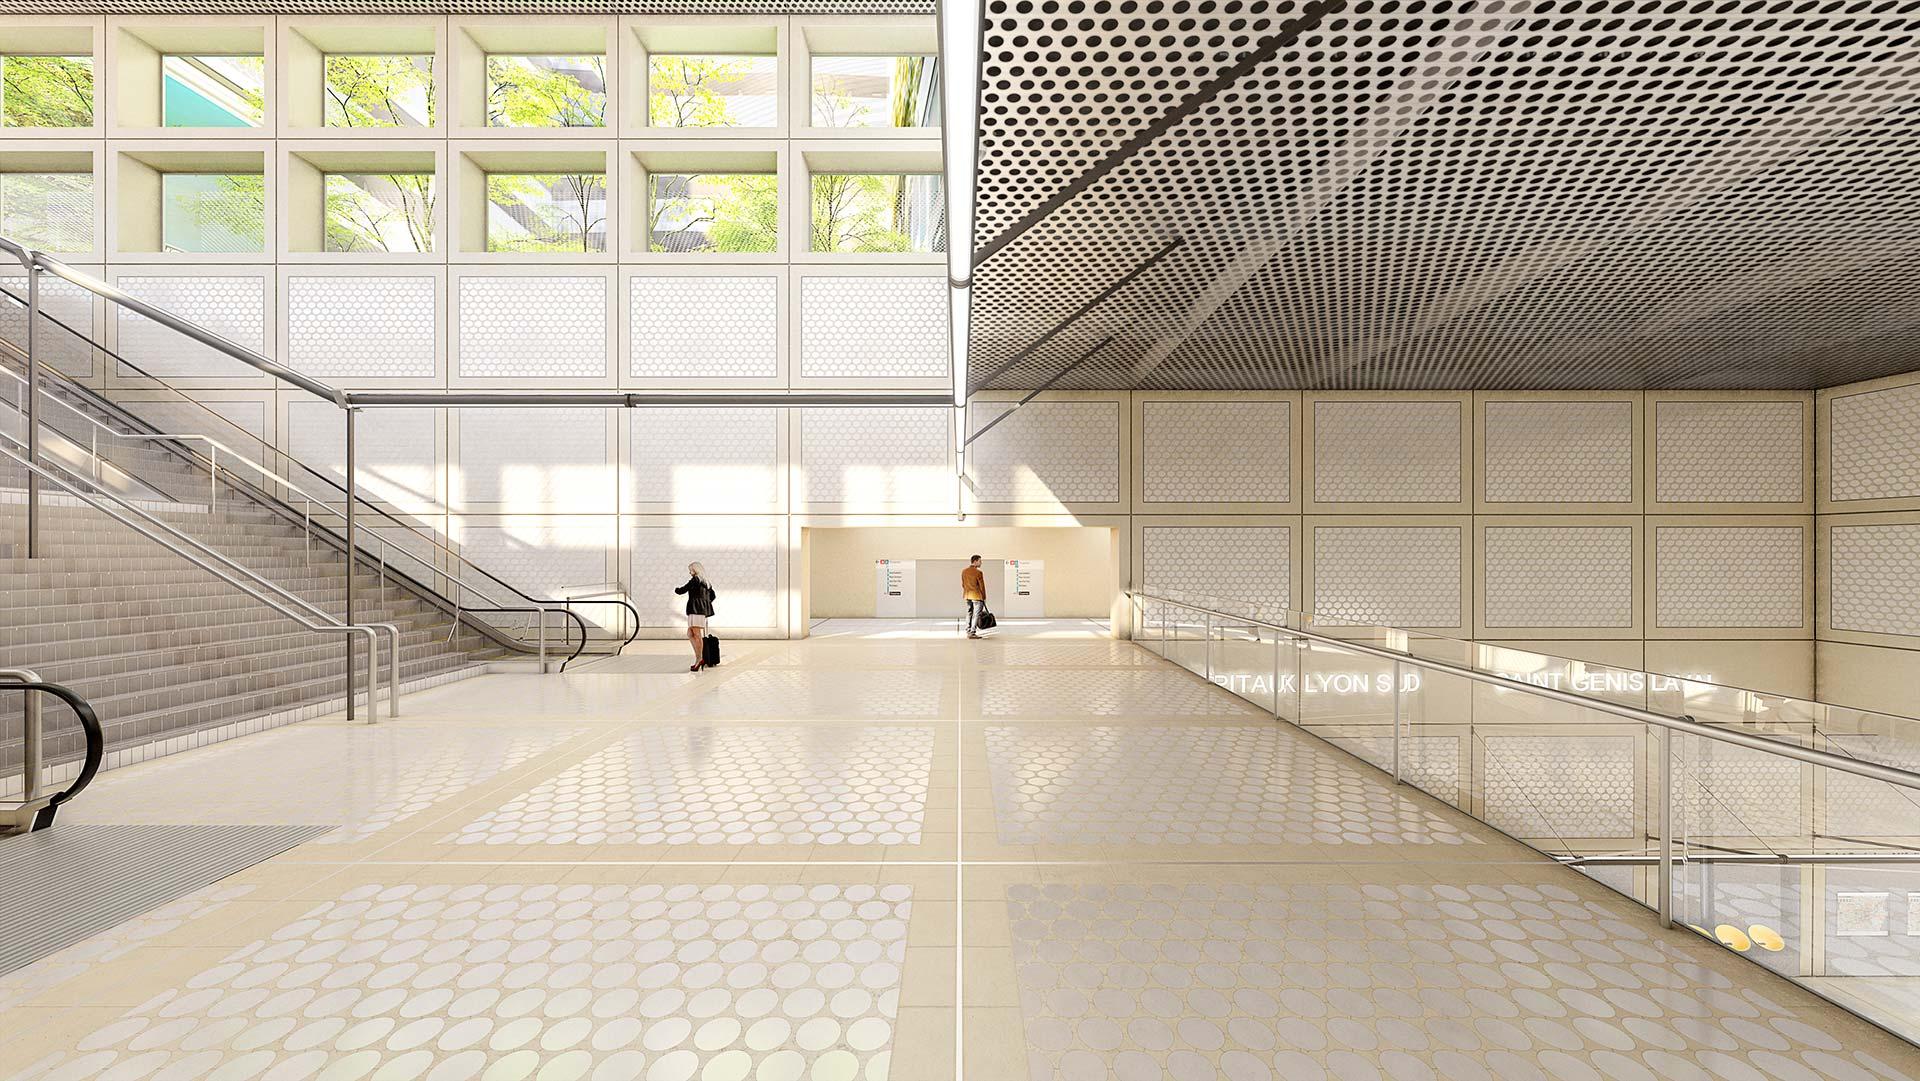 Mezzanine_image_3d_concours_metro_lyon